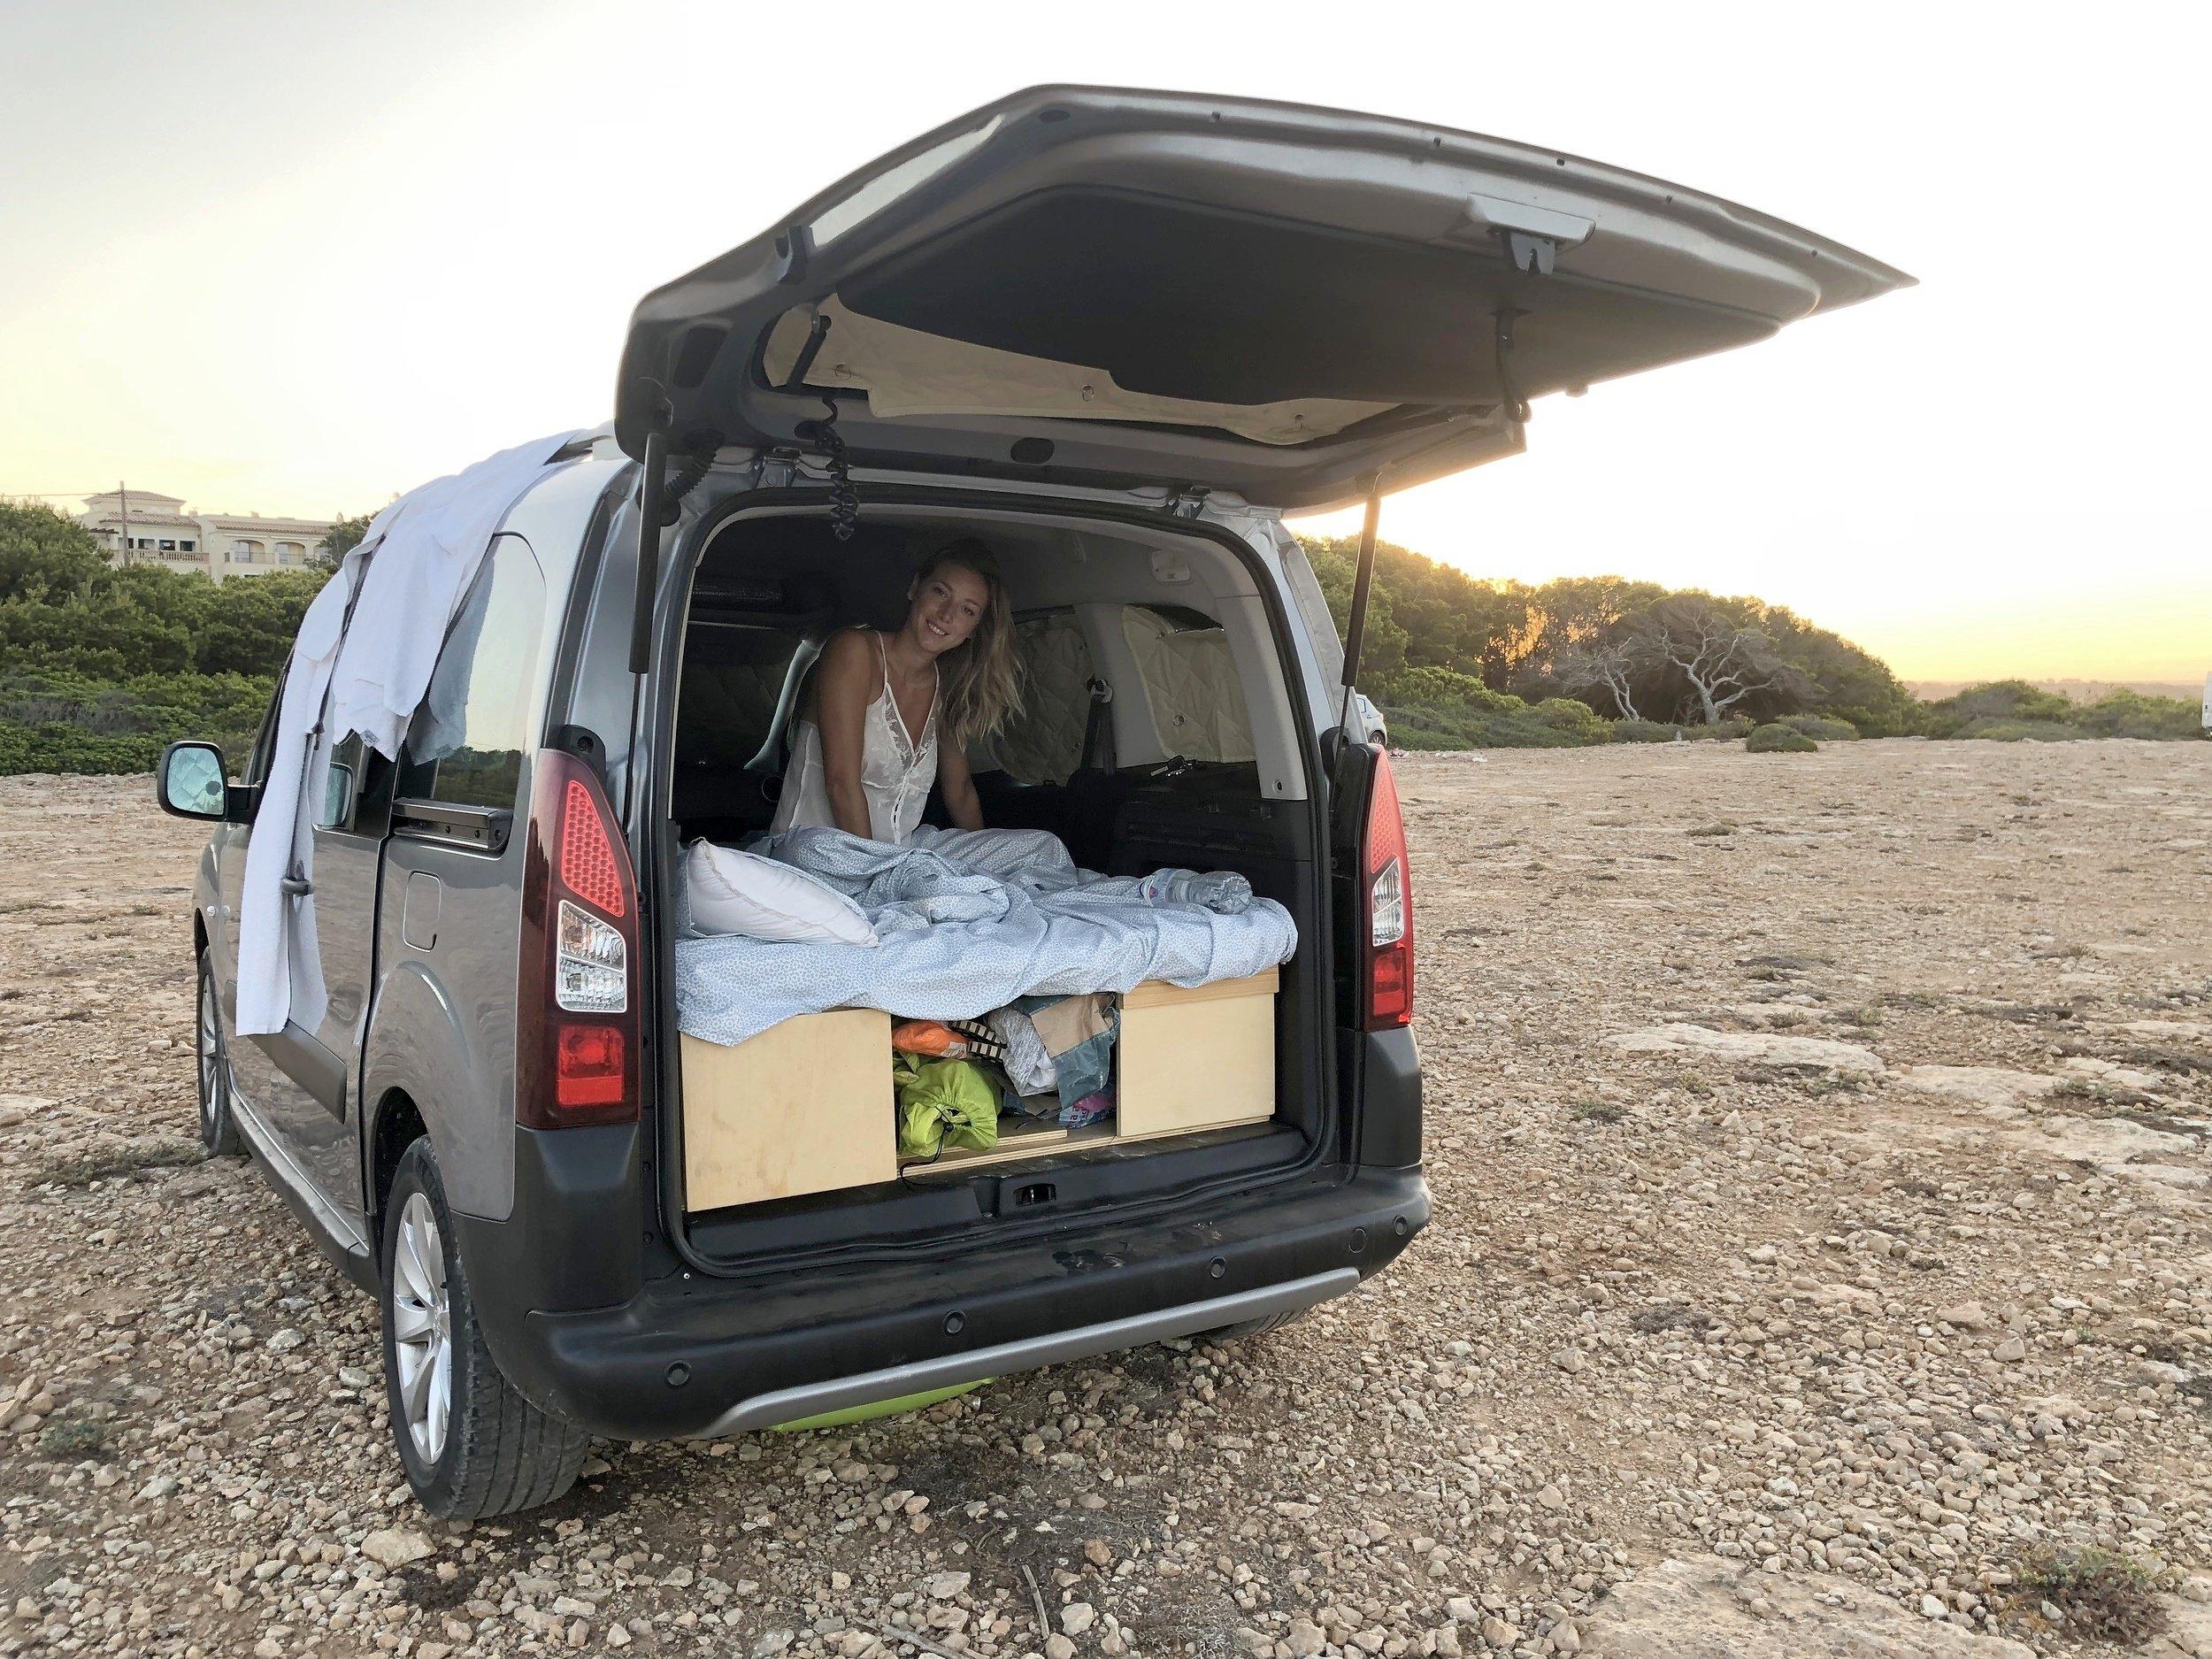 Alquiler Camper Gran Volumen Palma Peugeot Partner Teppe Multiadventure 2018 Yescapa